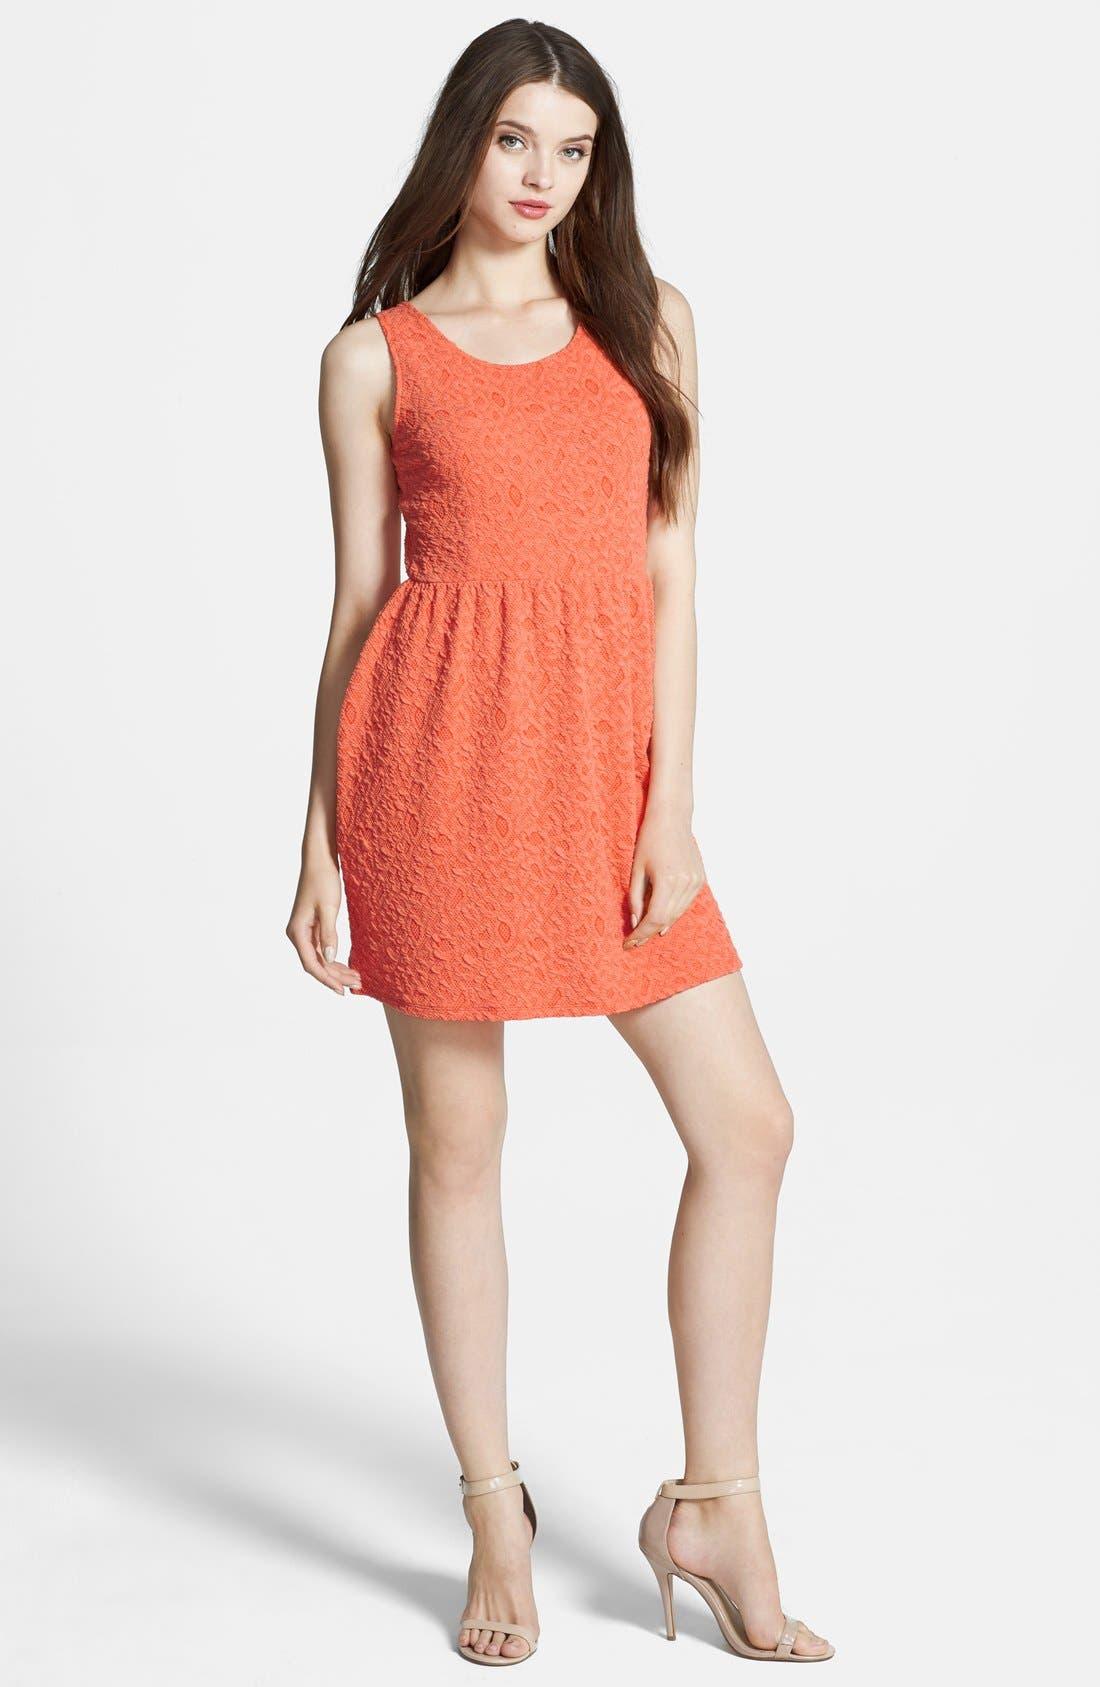 Main Image - Olive & Oak Back Cutout Textured Lace Fit & Flare Dress